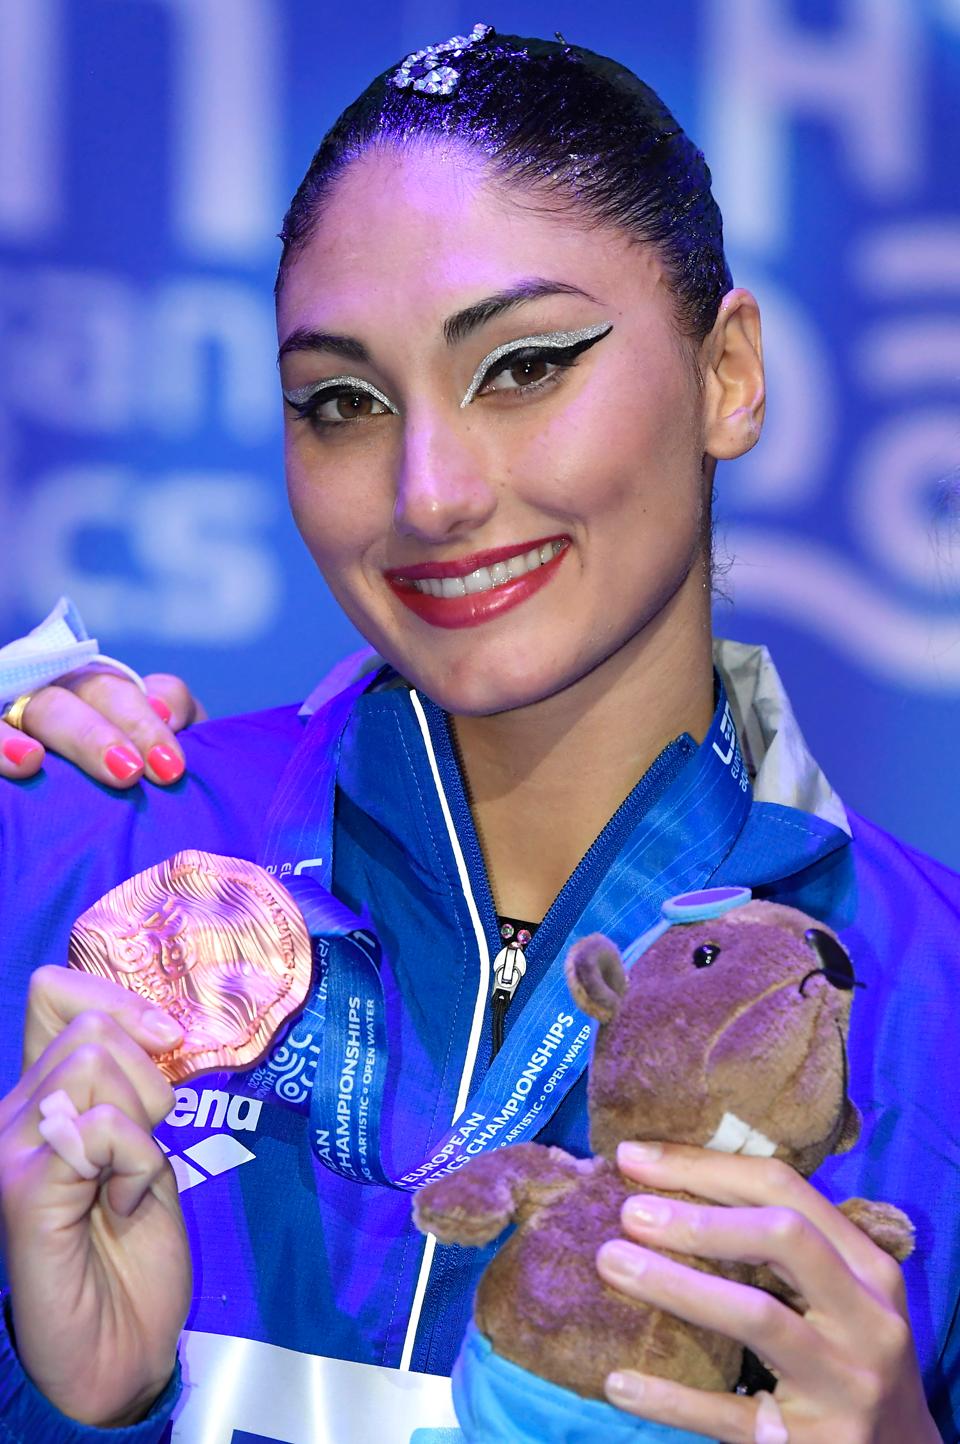 platanioti-wins-silver-medal-at-european-aquatics-championships-in-budapest1